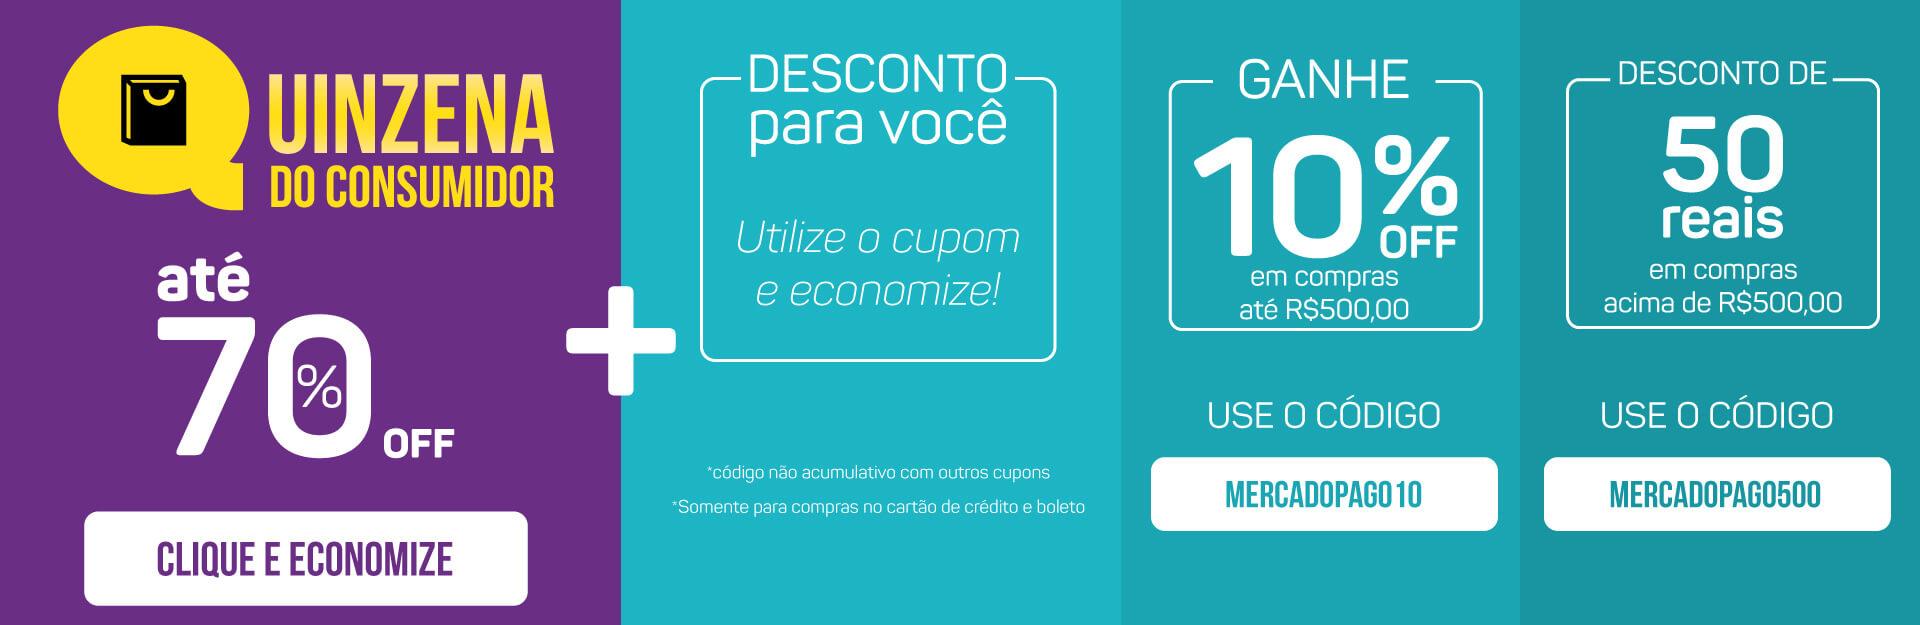 Banner Quinzena do Consumidor + Cupom